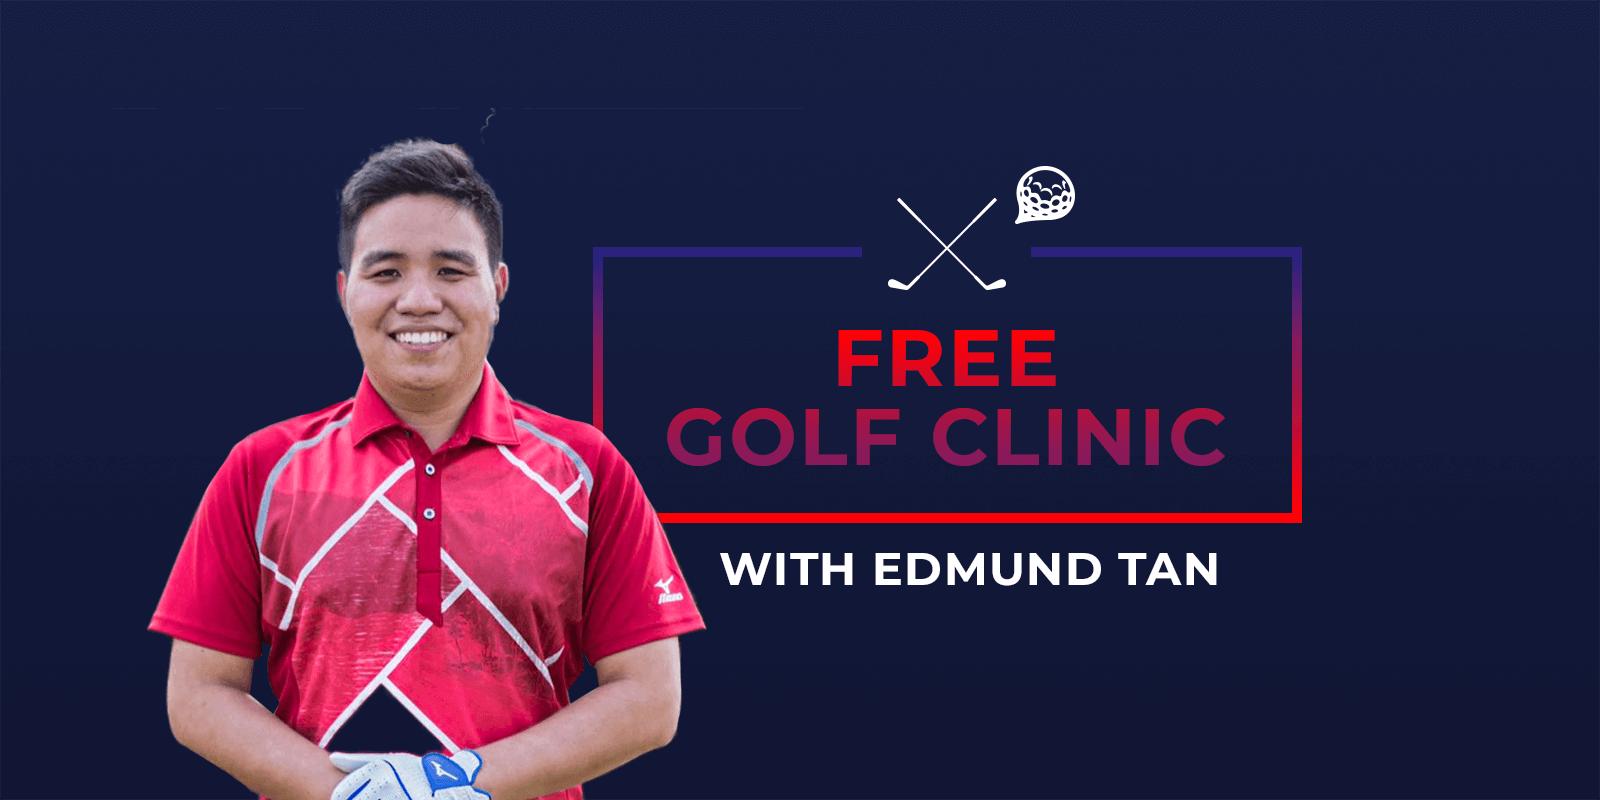 deemples: edmund tan free golf clinic